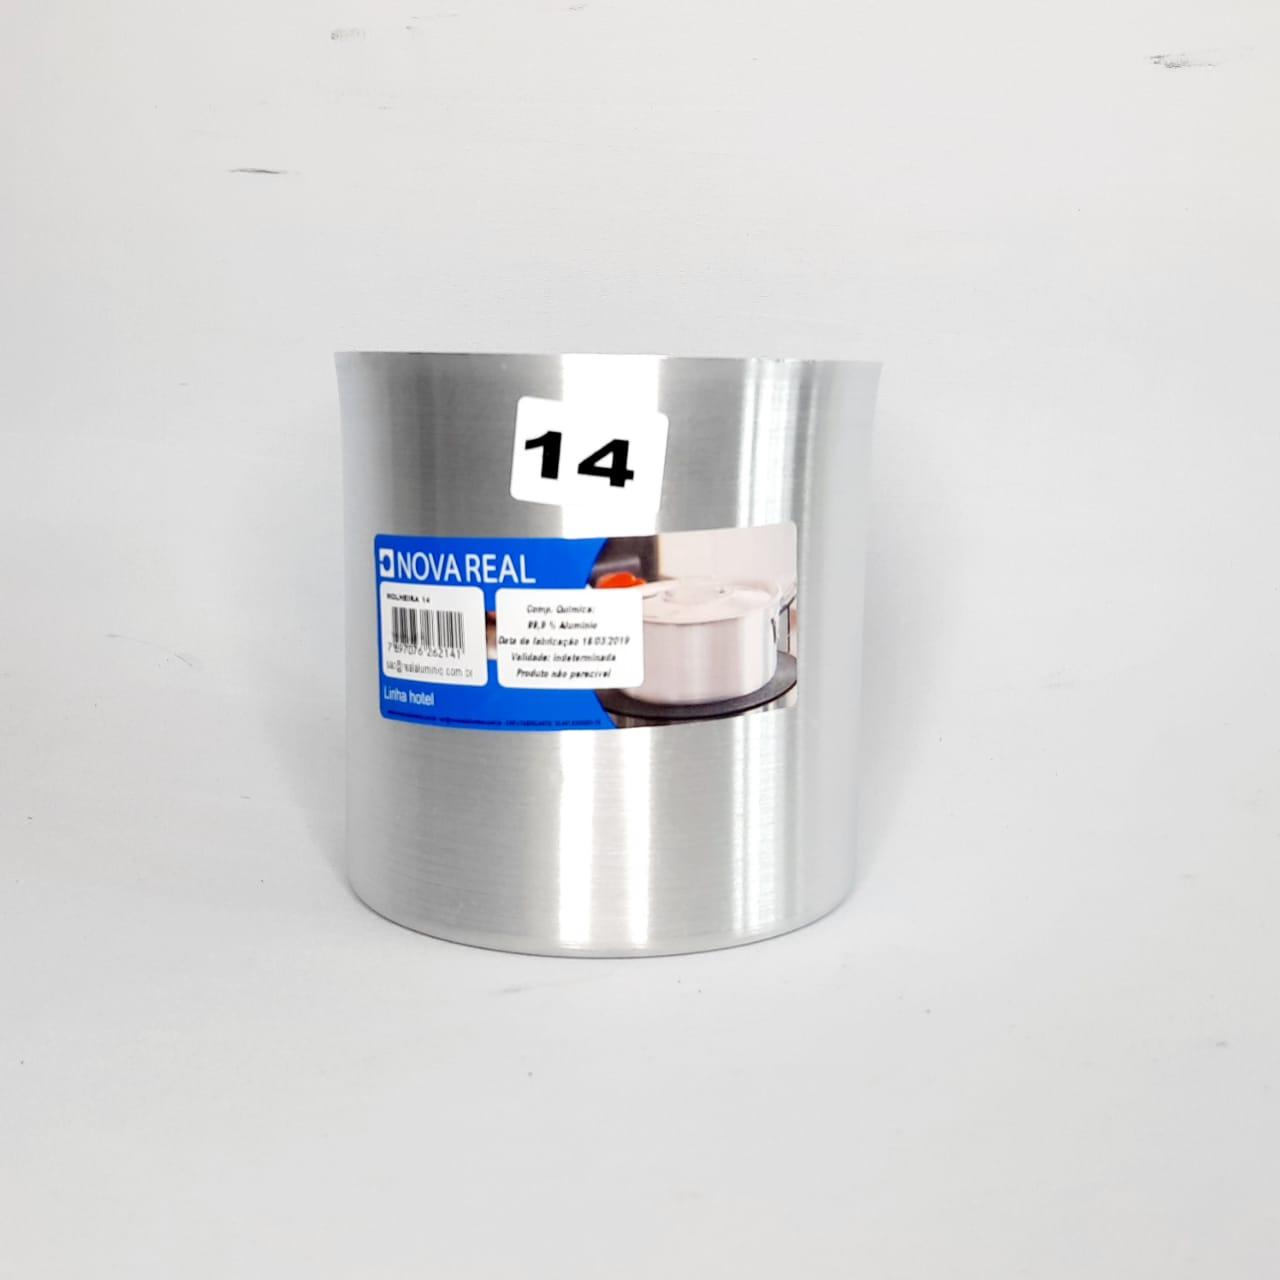 Molheira Alumínio N 14 S/ABA Real